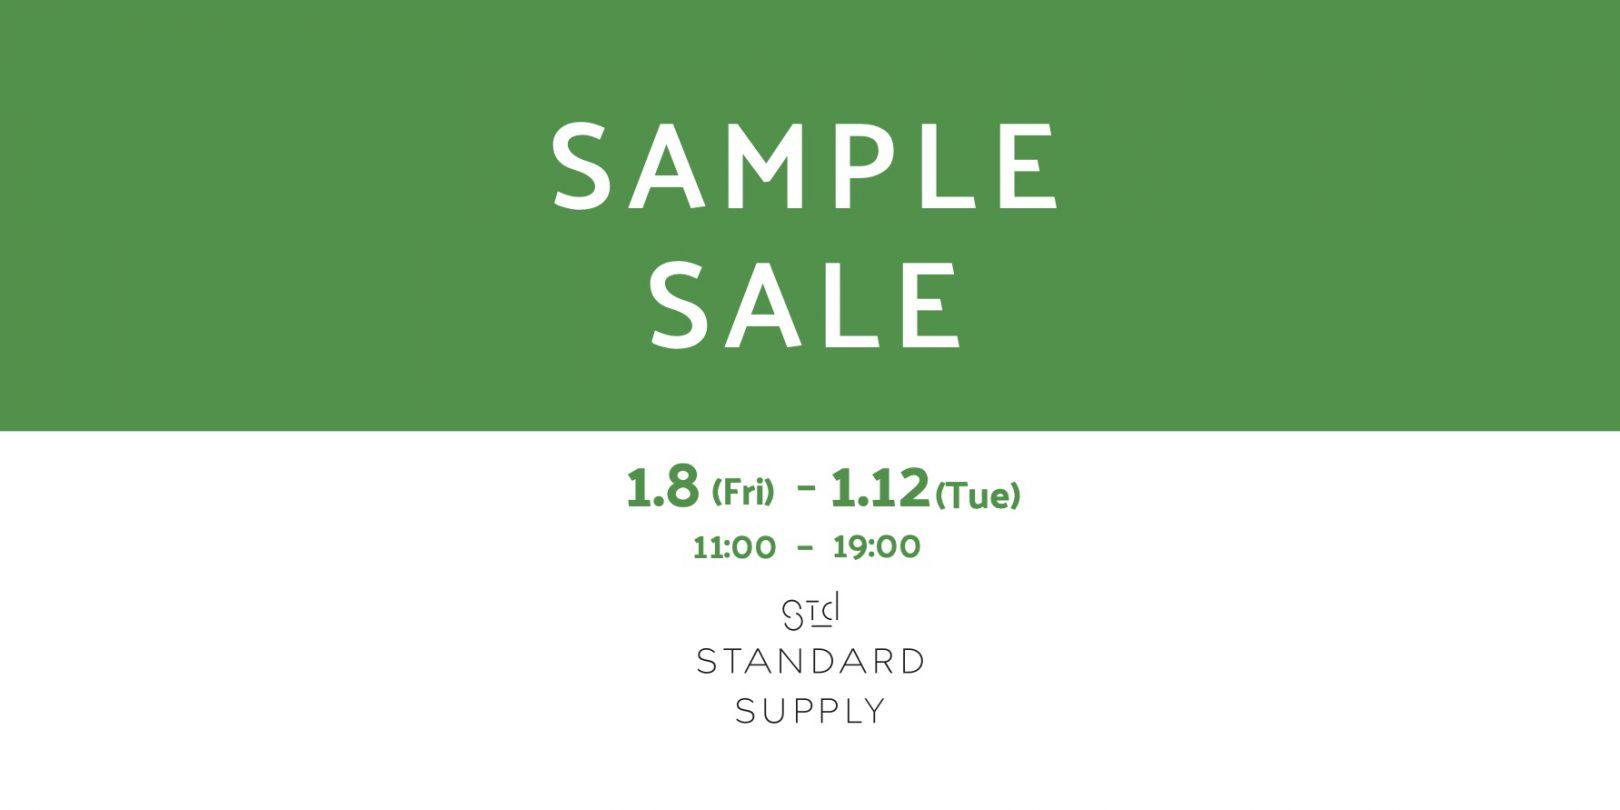 【STANDARD SUPPLY 二子玉川】サンプルセール開催のお知らせ